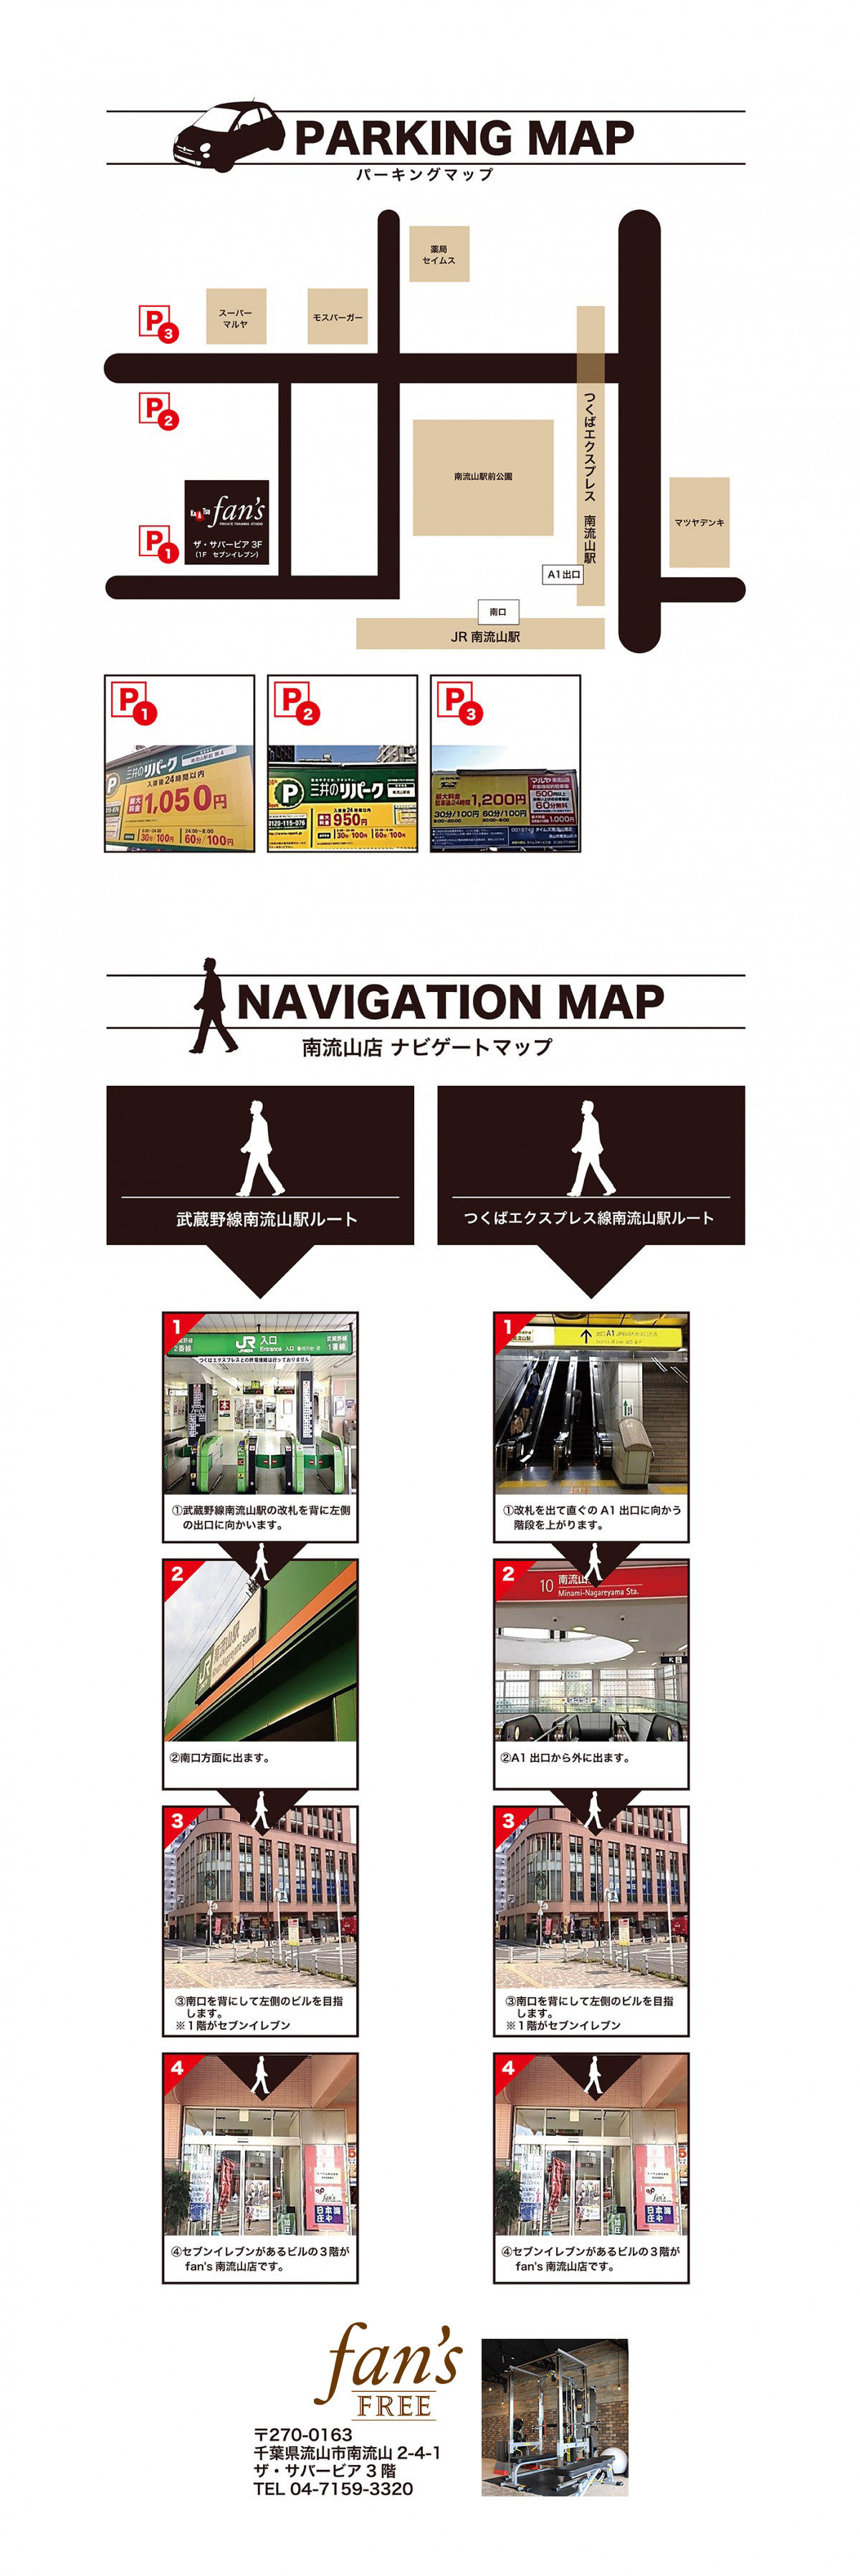 fan's南流山店パーキングマップ